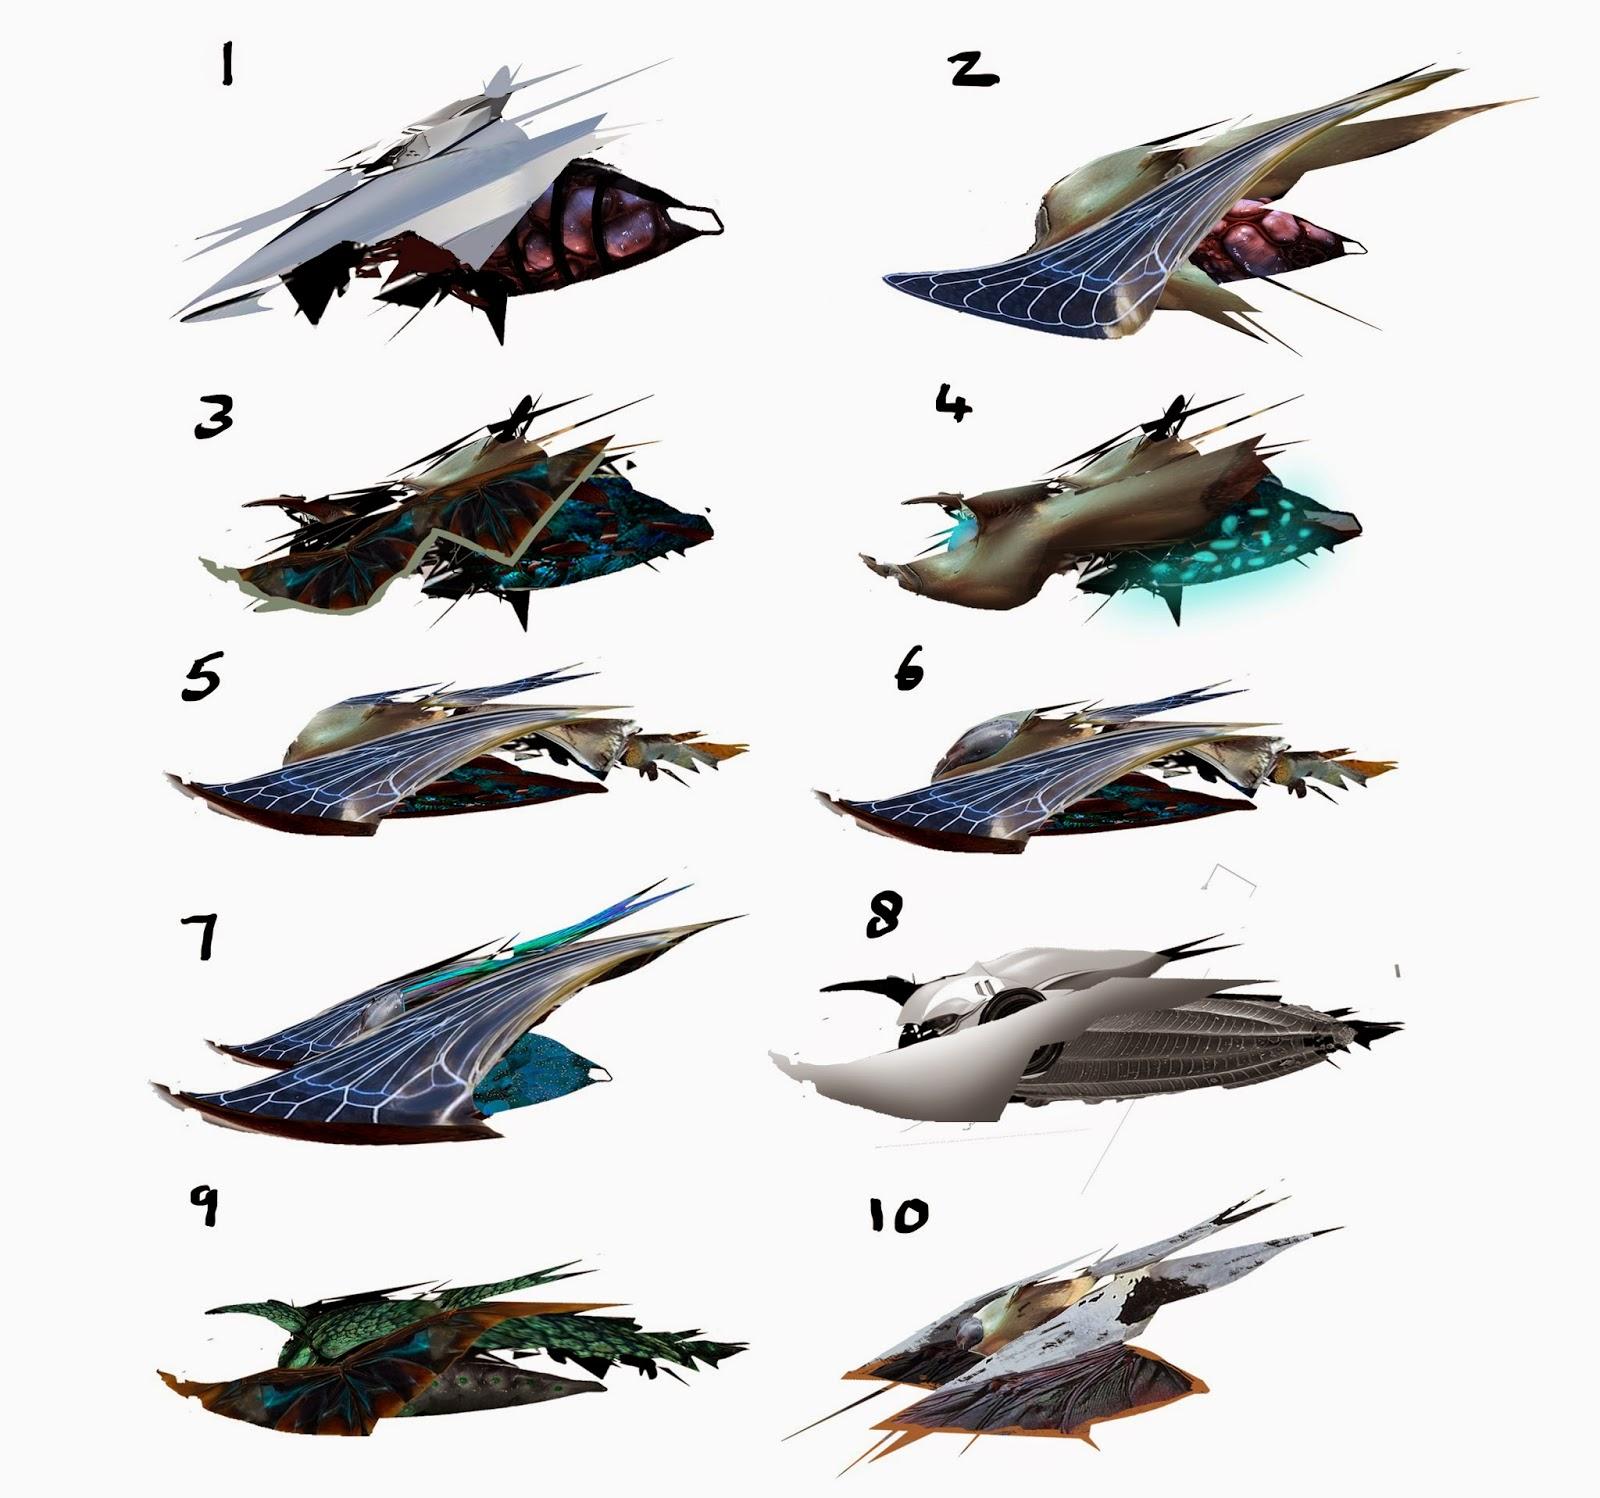 Insect spaceship design finn 39 s game art blog for Spaceship design